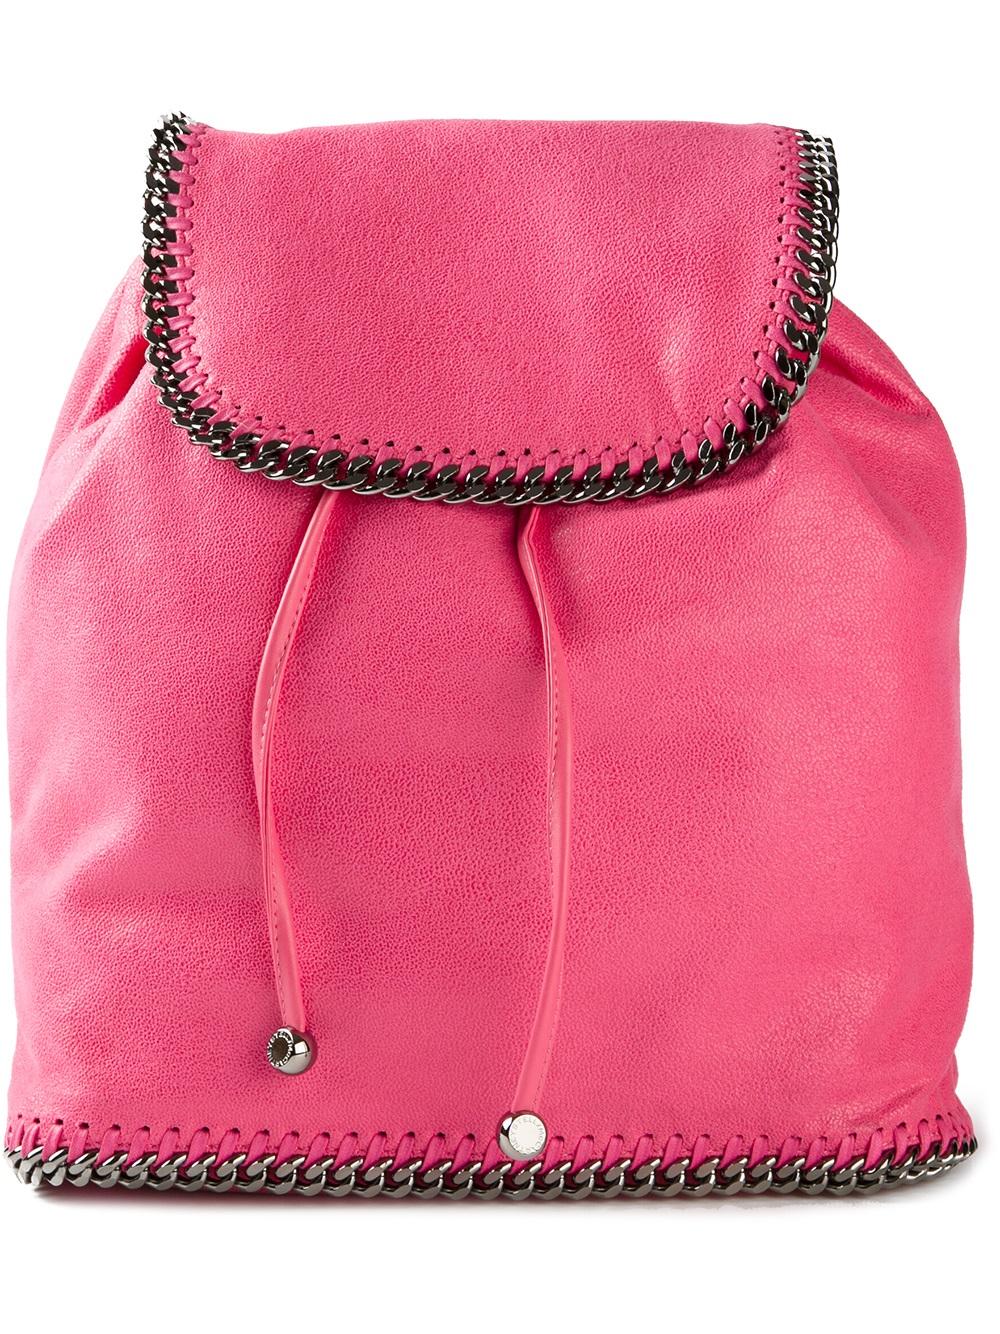 stella mccartney chain trim rucksack in pink lyst. Black Bedroom Furniture Sets. Home Design Ideas